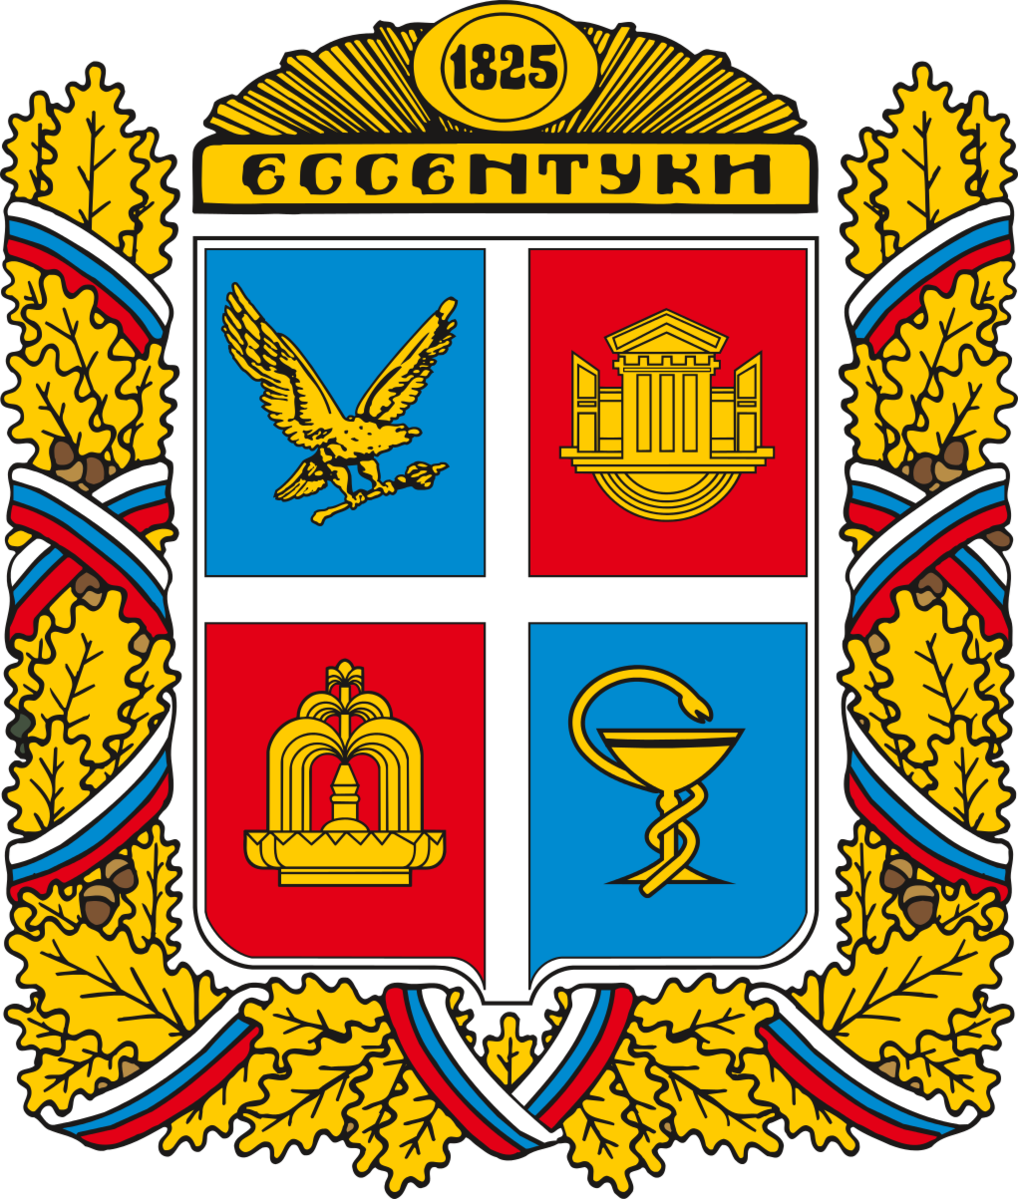 1018px-Coat_of_Arms_of_Essentuki_(Stavro